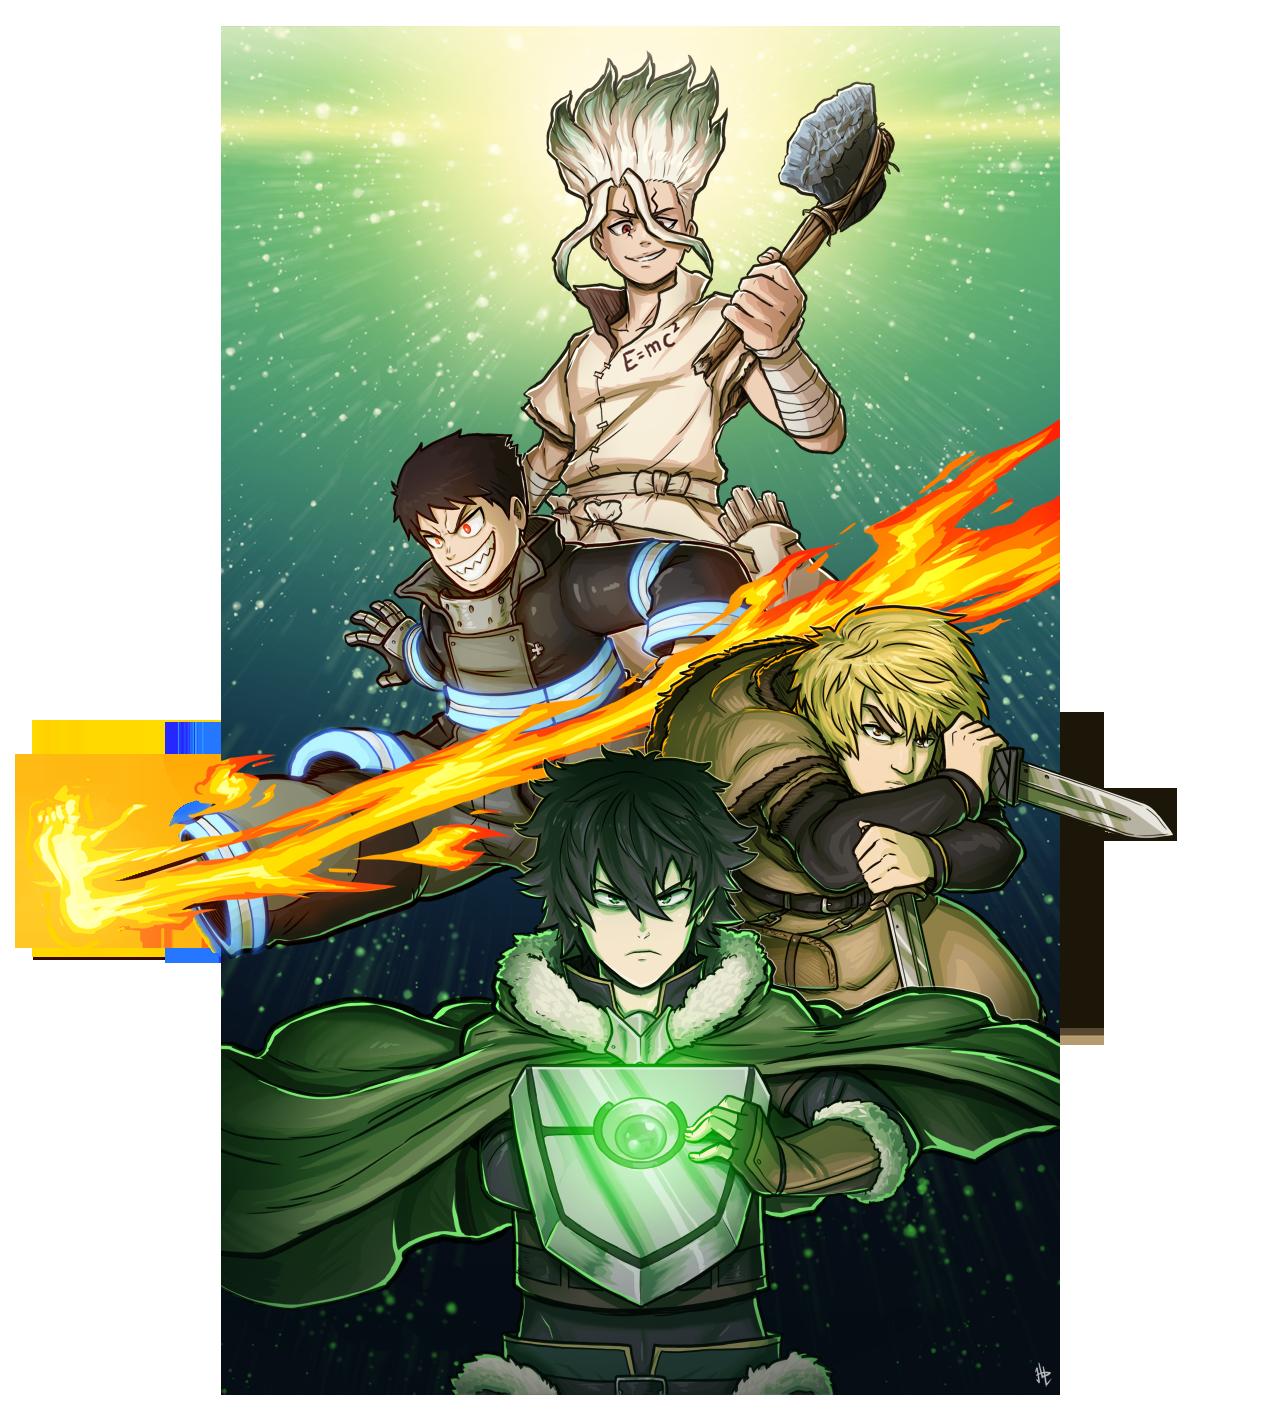 Anime Summer Season 2019 (plus Shield Hero)